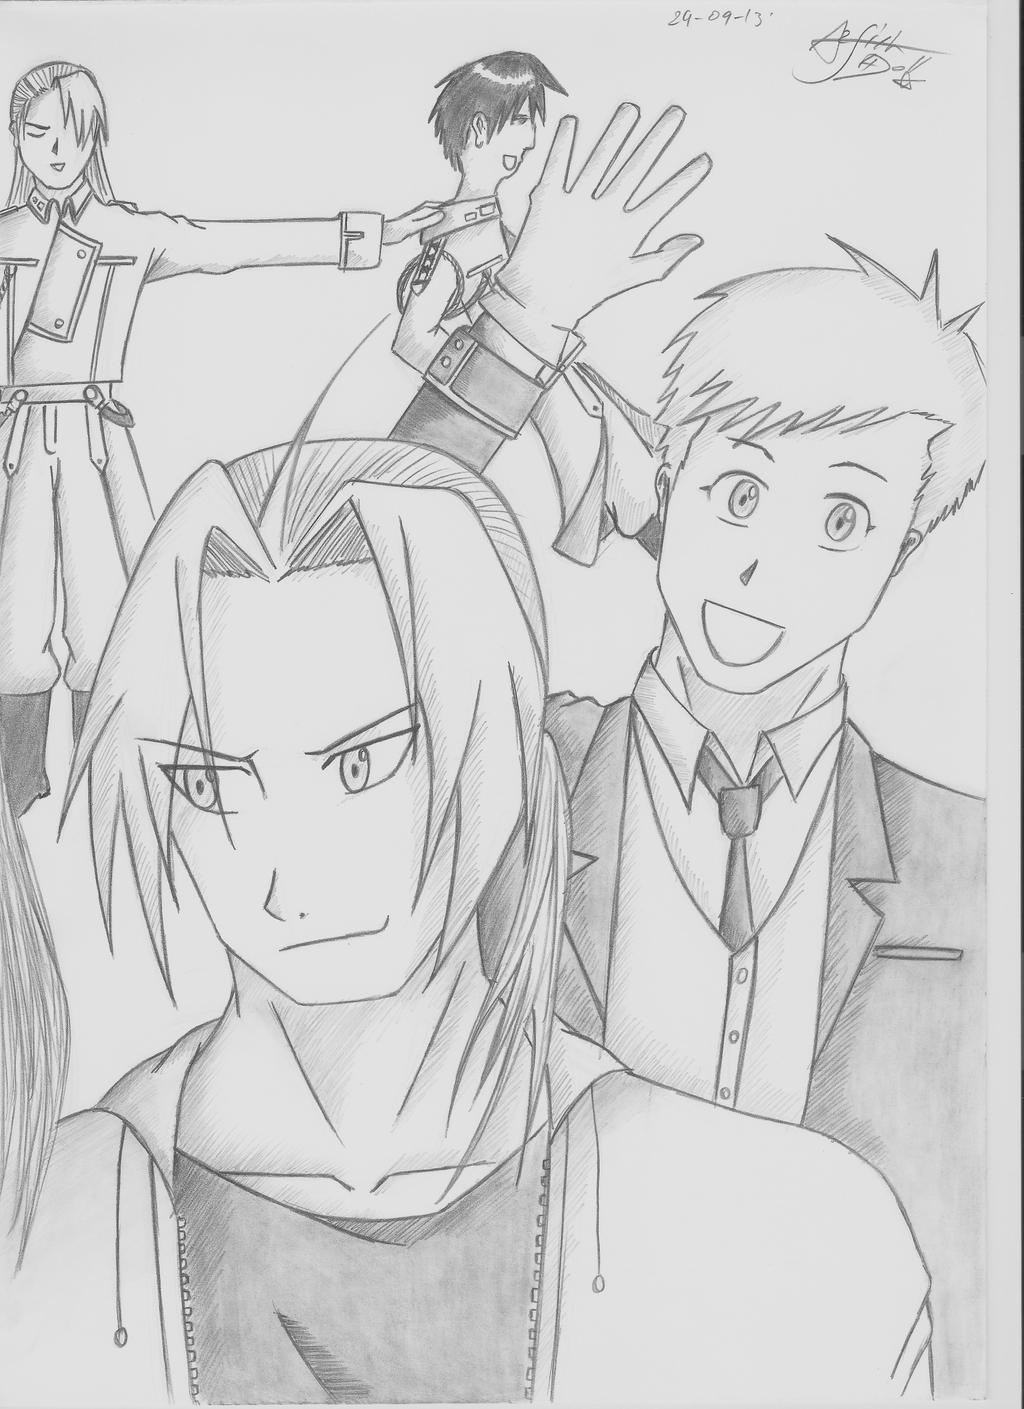 Fullmetal Alchemist brotherhood Ending by Arsiekdhol on DeviantArt